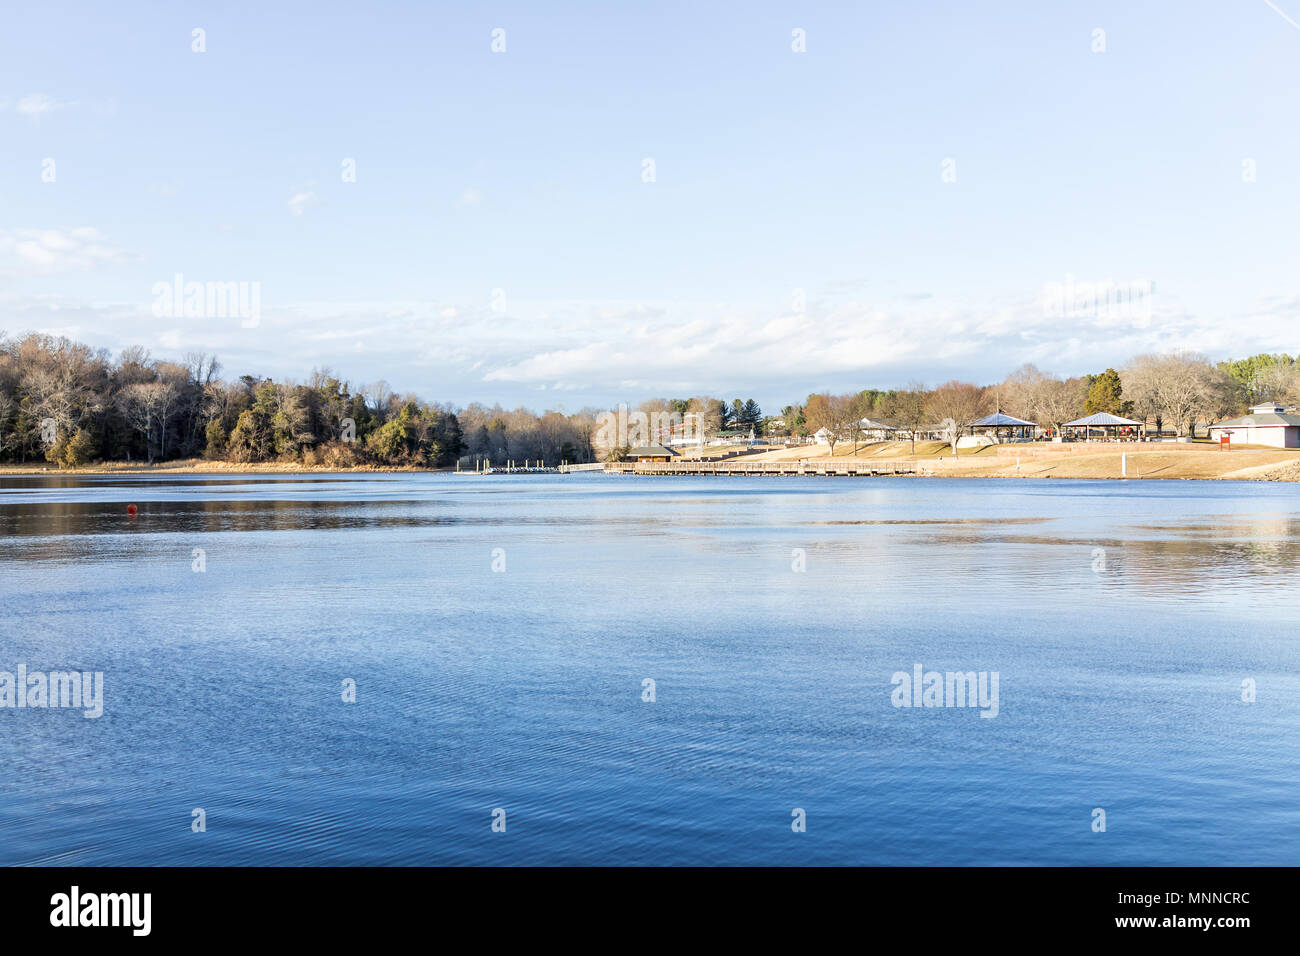 Lake Fairfax Park in winter in Reston, Virginia with